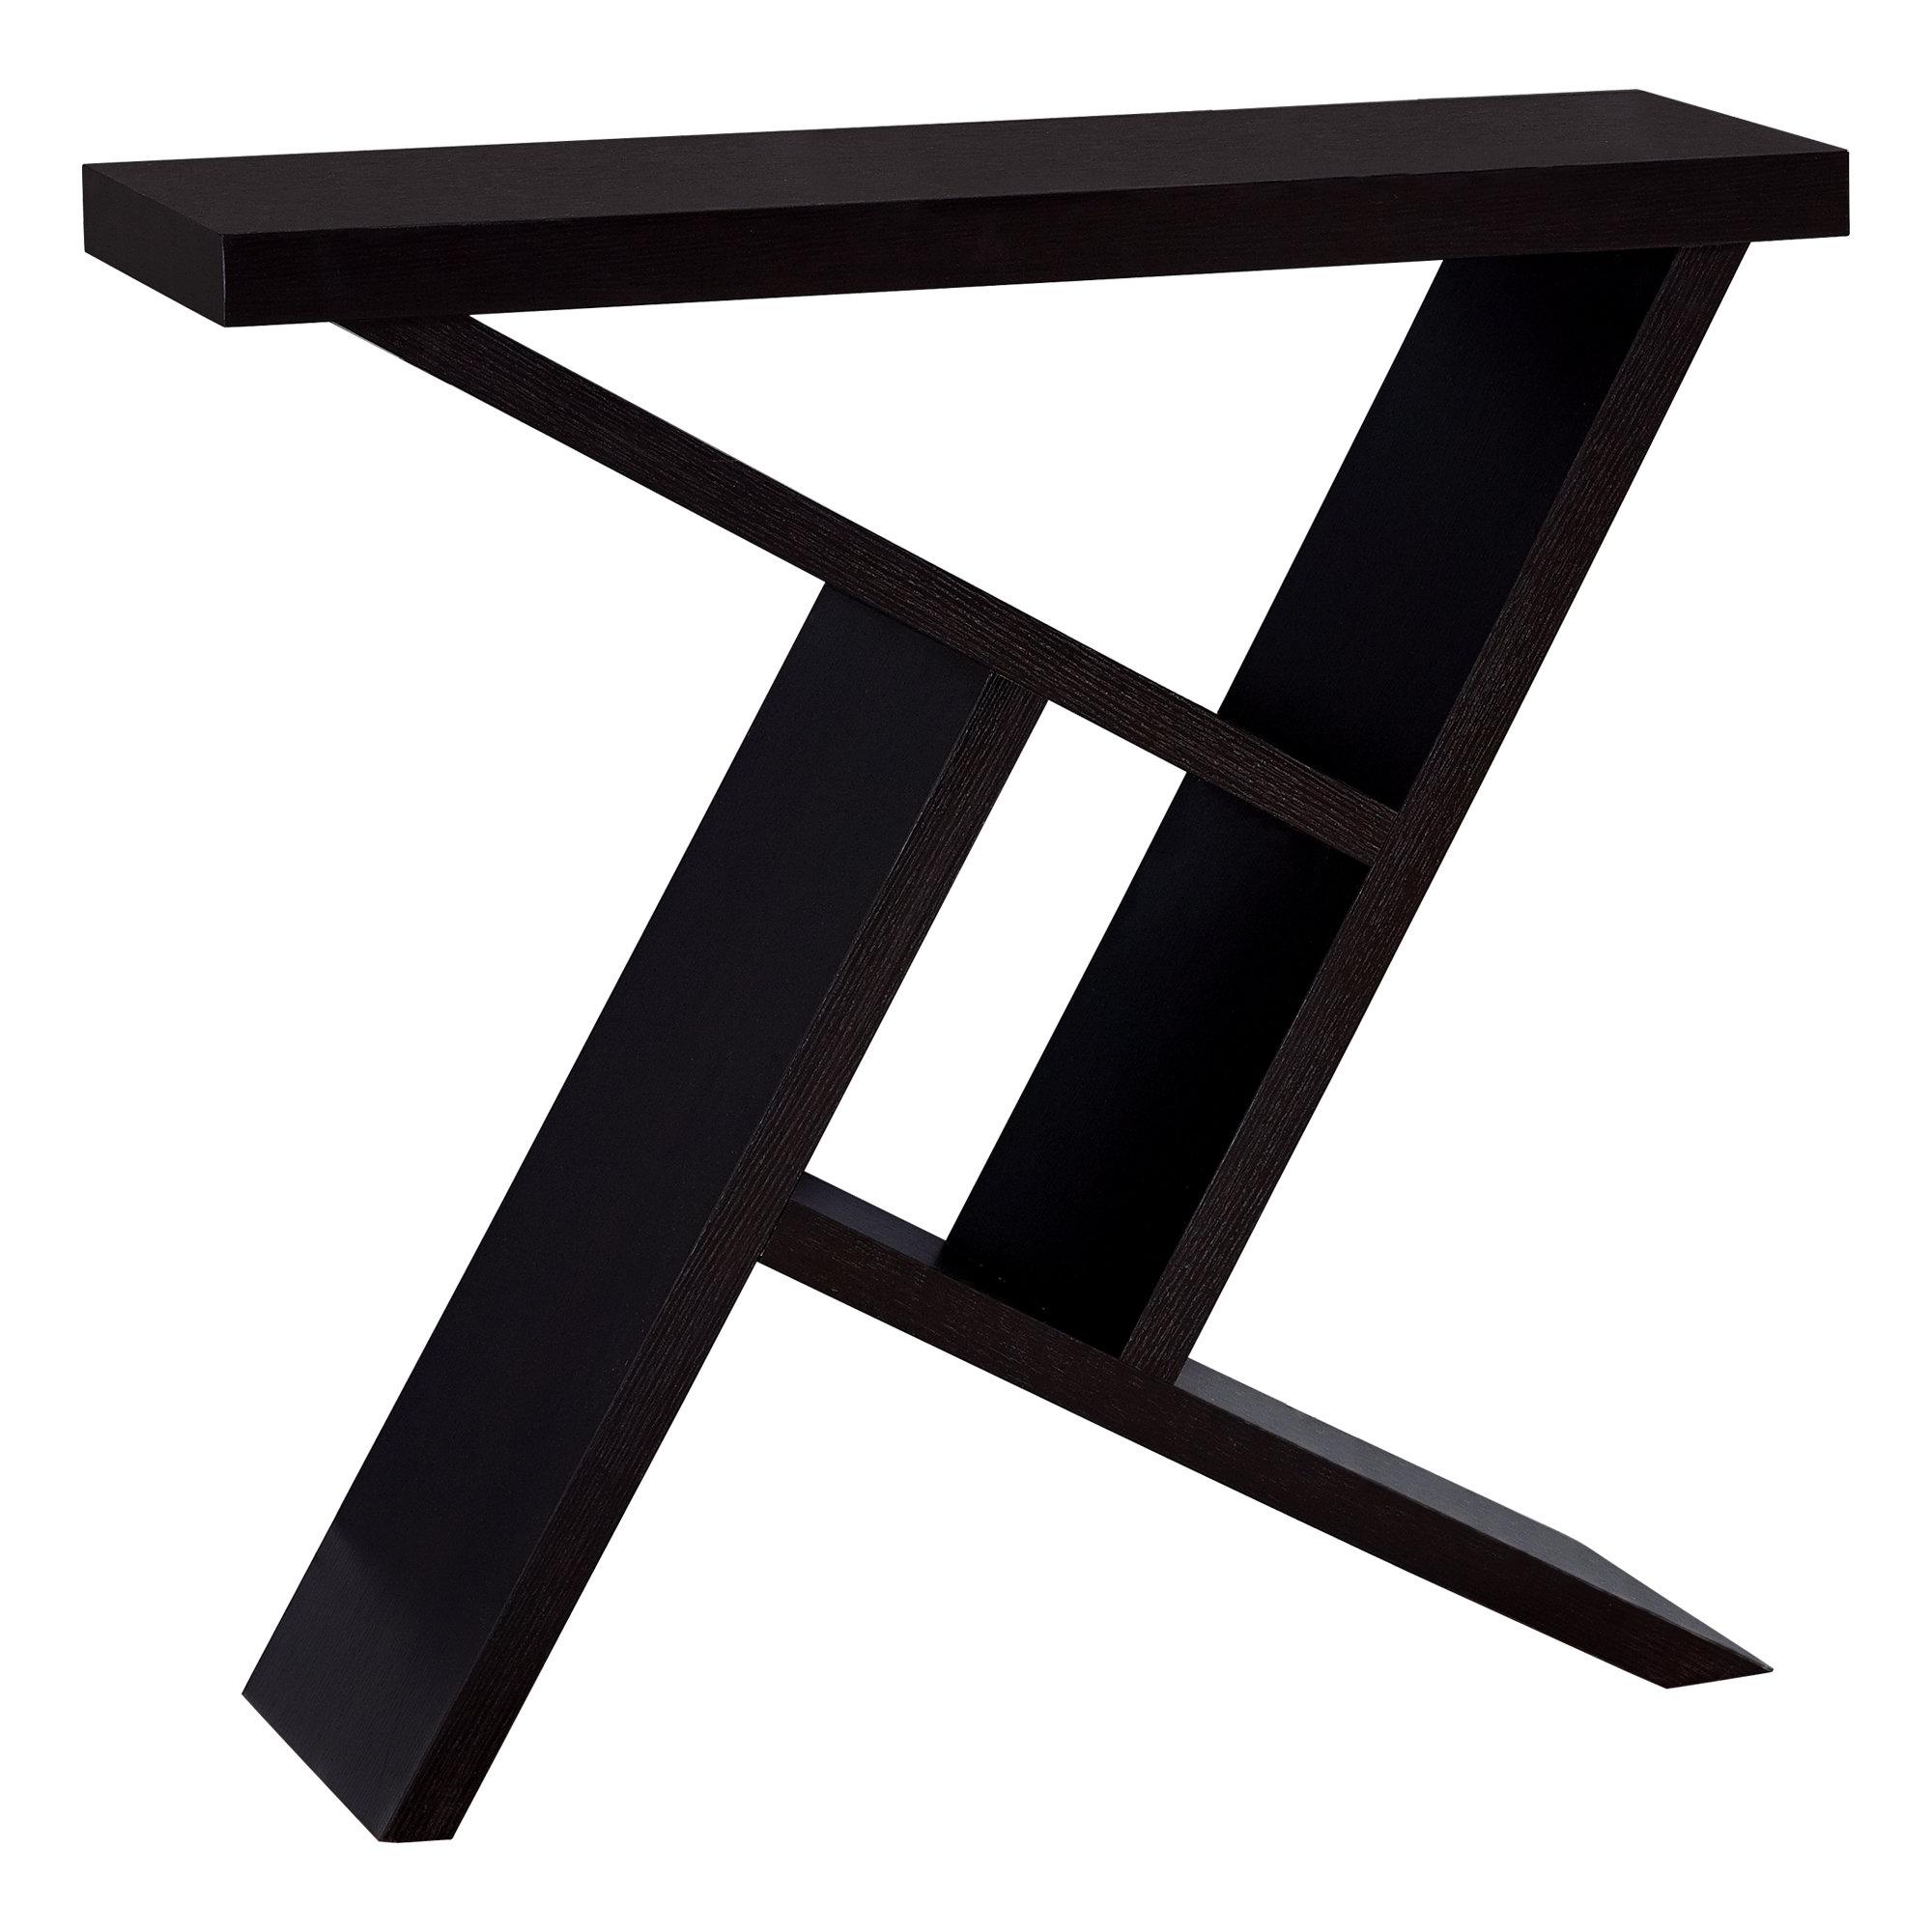 "ACCENT TABLE - 36""L / CAPPUCCINO HALL CONSOLE"